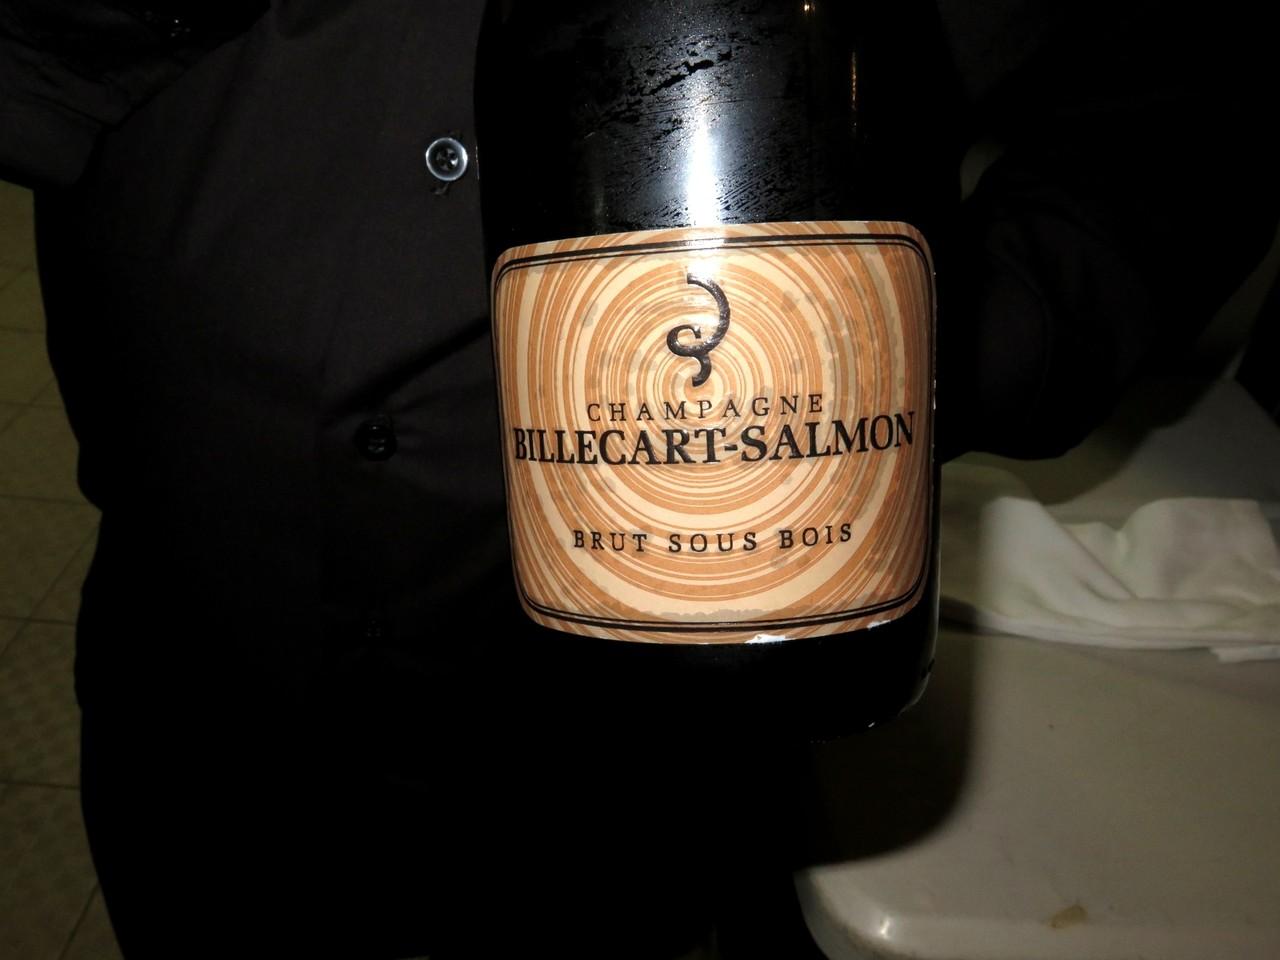 Billecart-Salmon Brut Sous-Bois